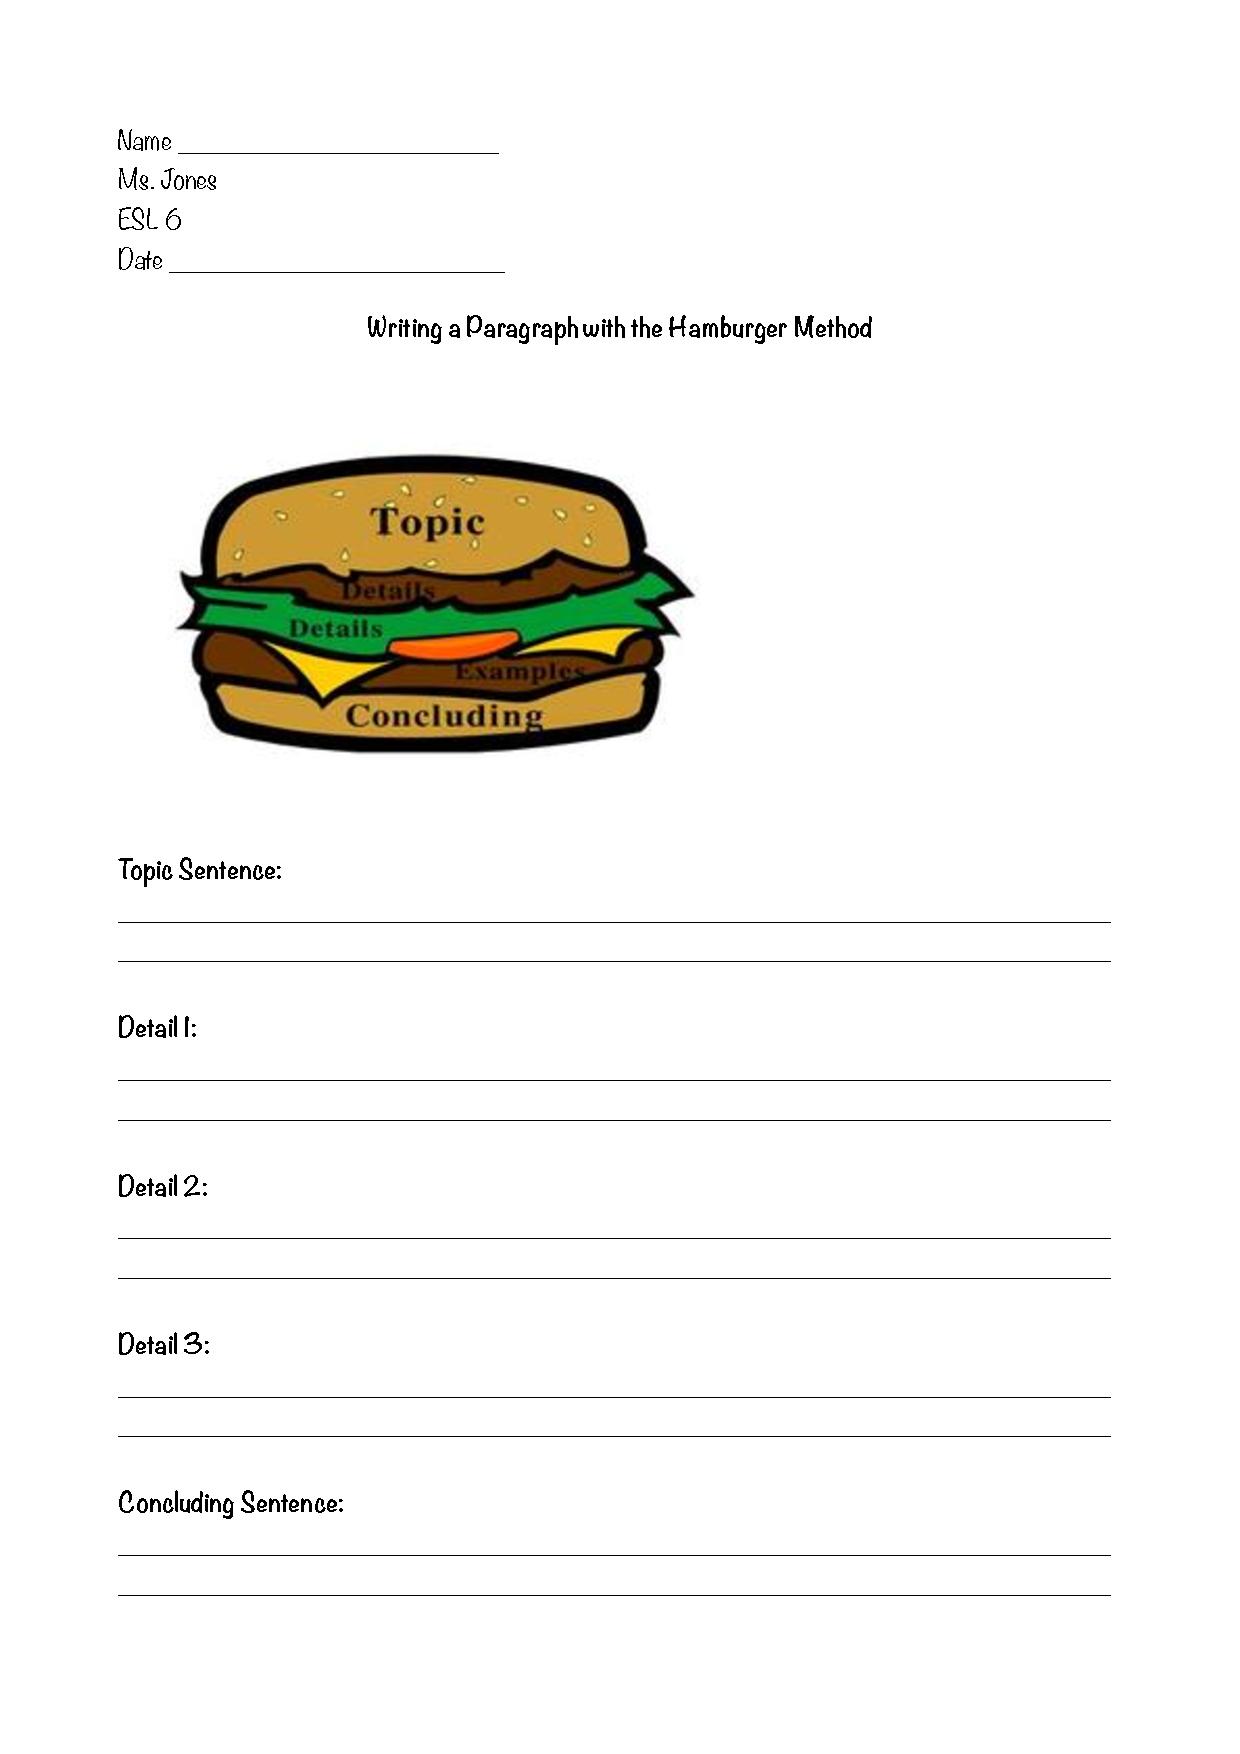 Hamburger Organizer For Writing Template